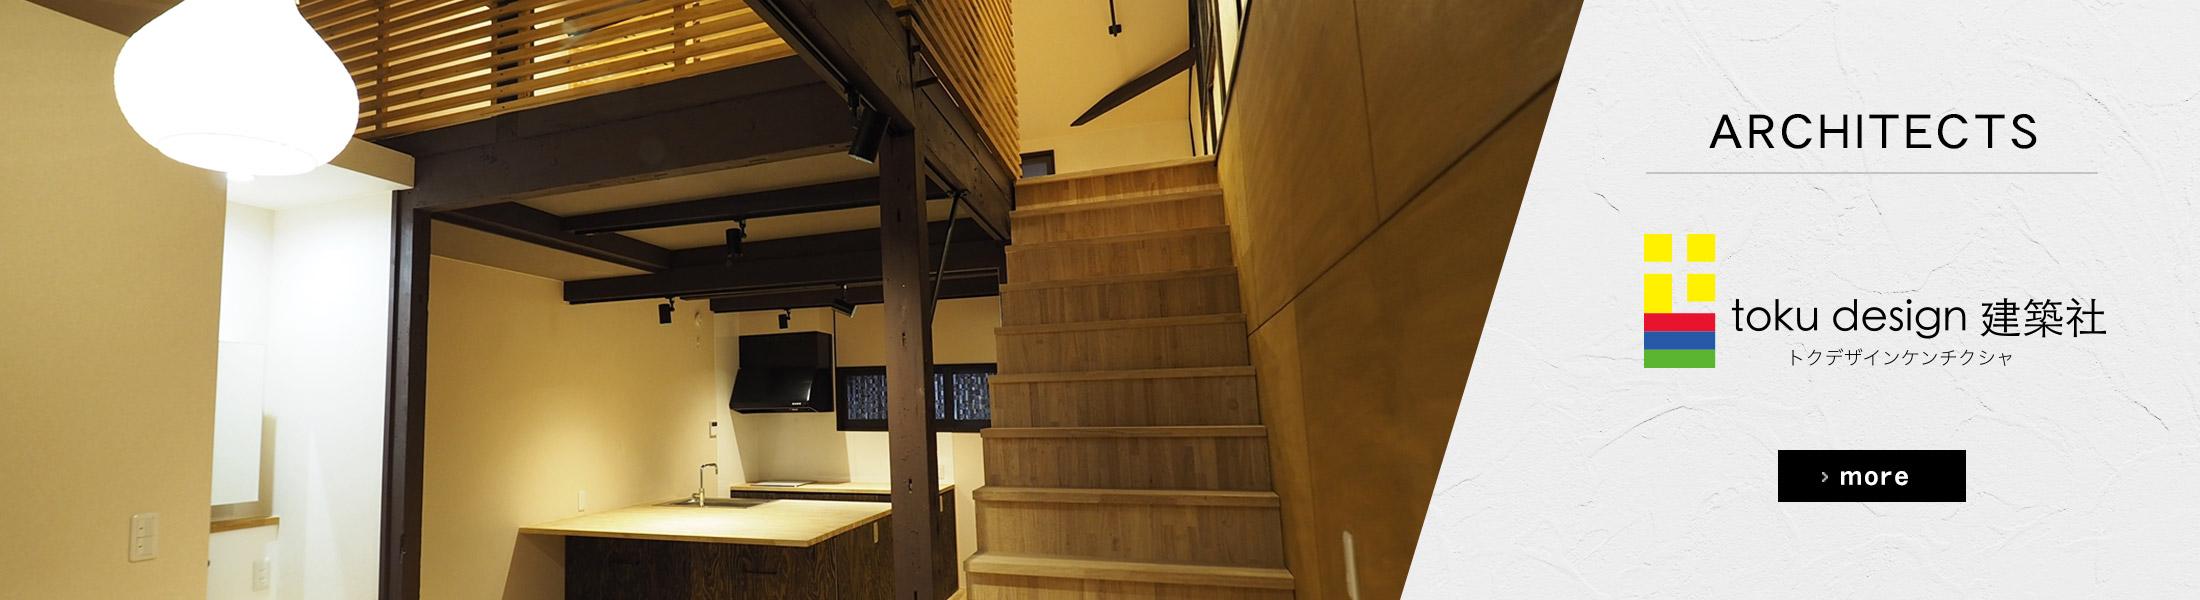 toku design 建築社